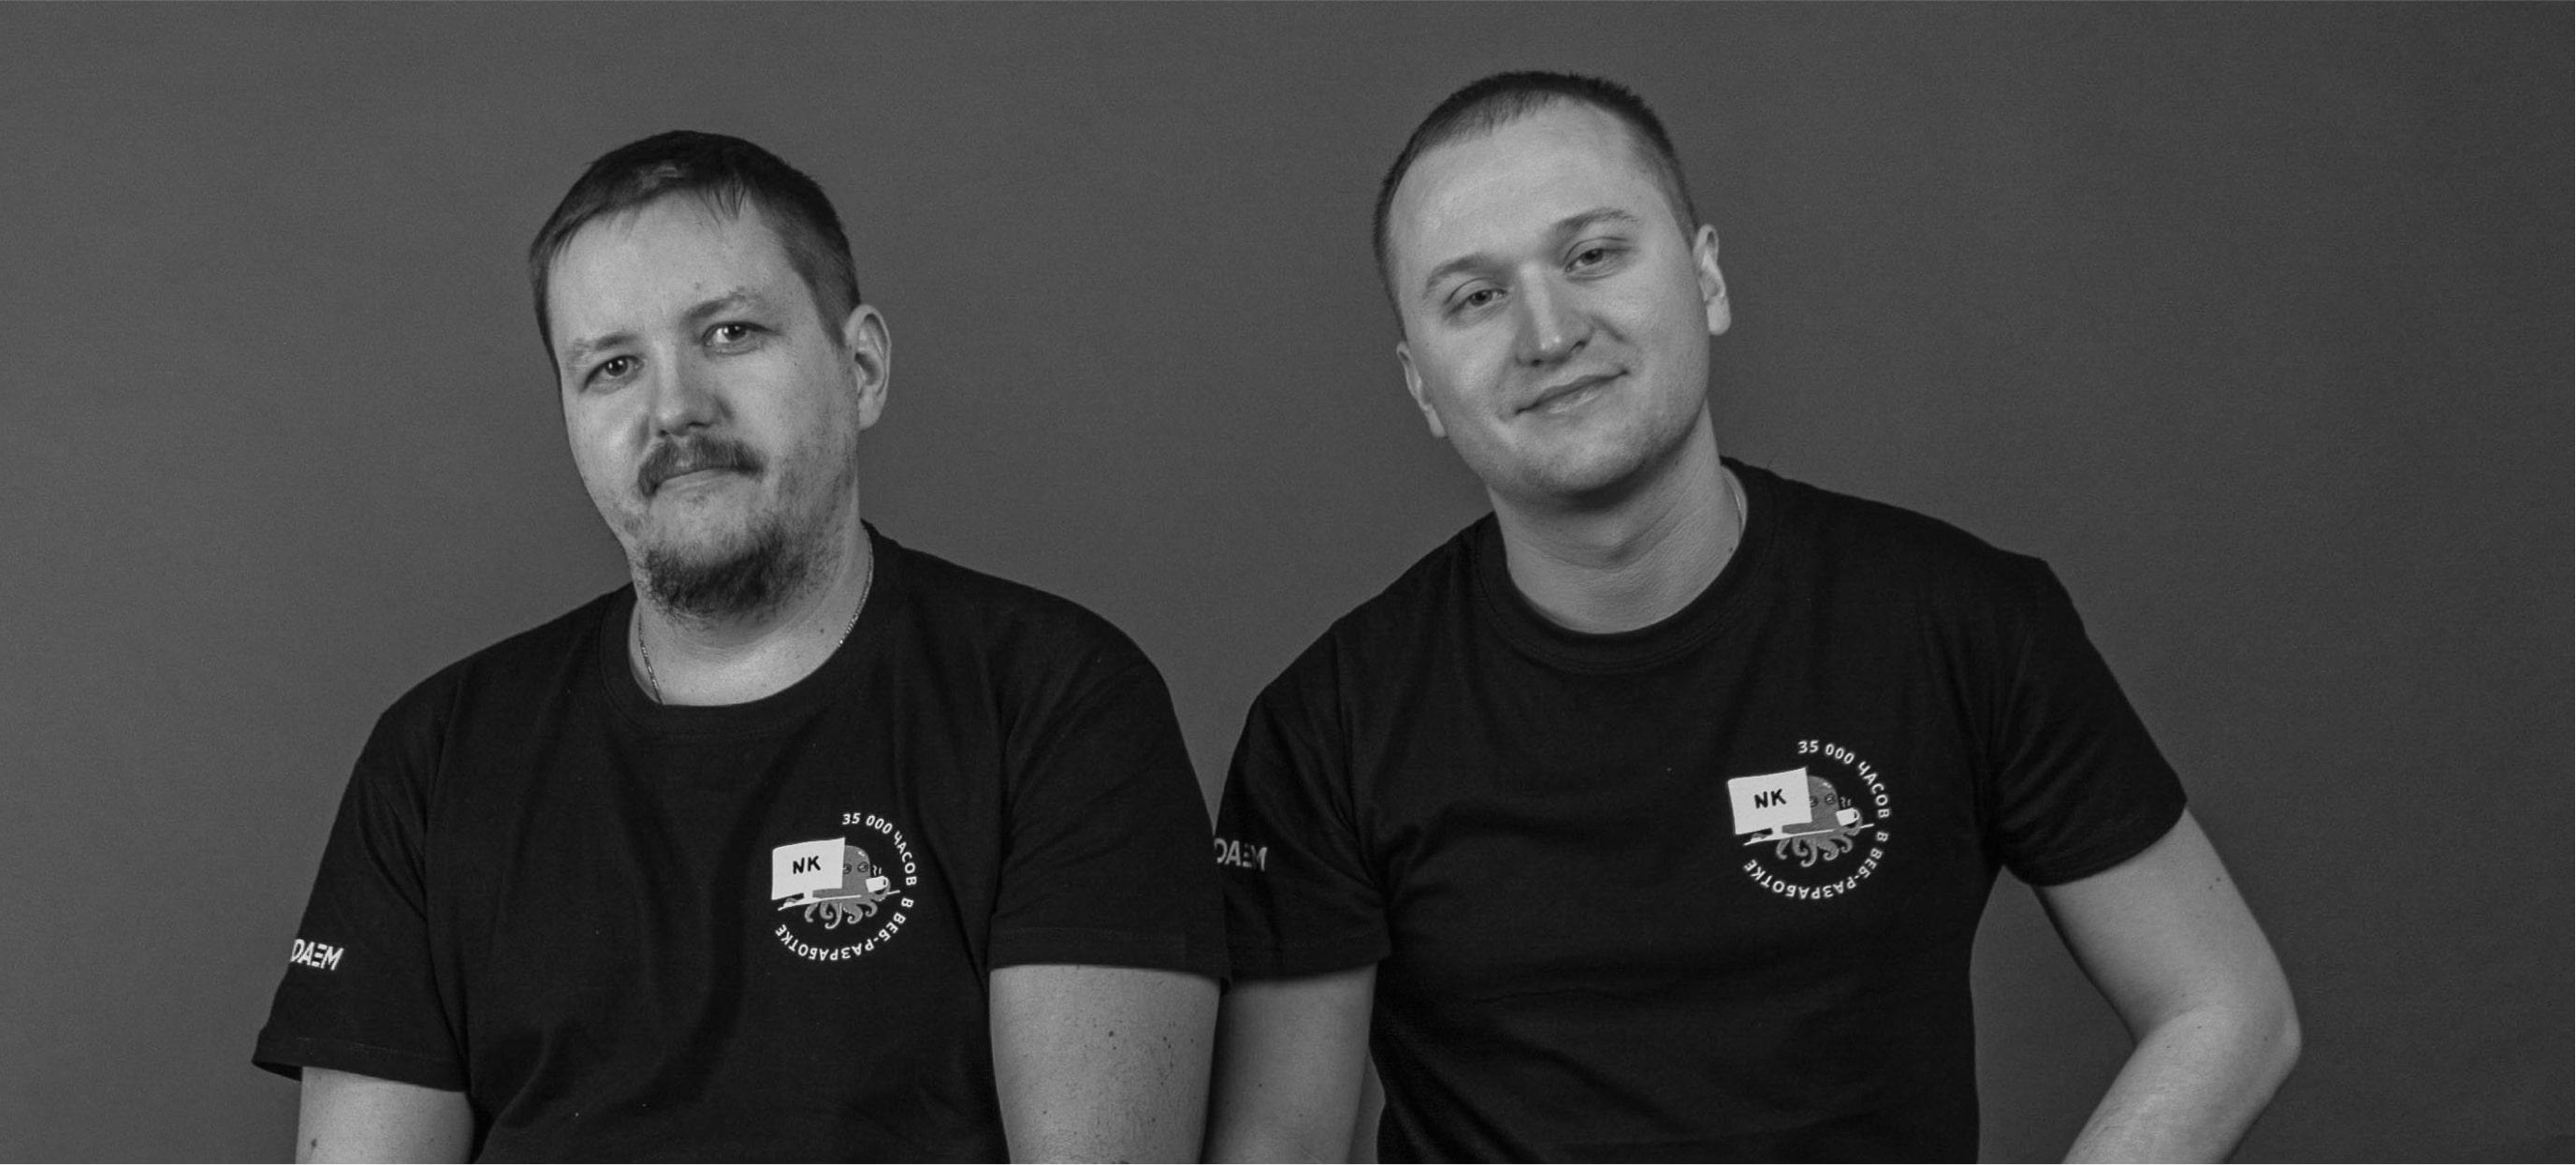 Дмитрий Любимцев и Кирилл Марченко – основатели НеКидаем